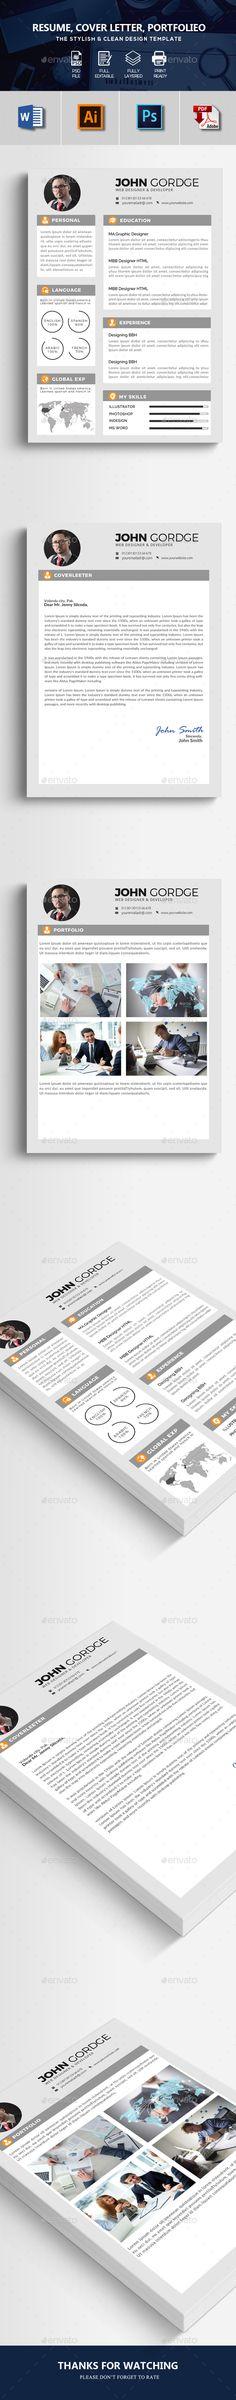 CV Resume Template PSD, AI, MS Word